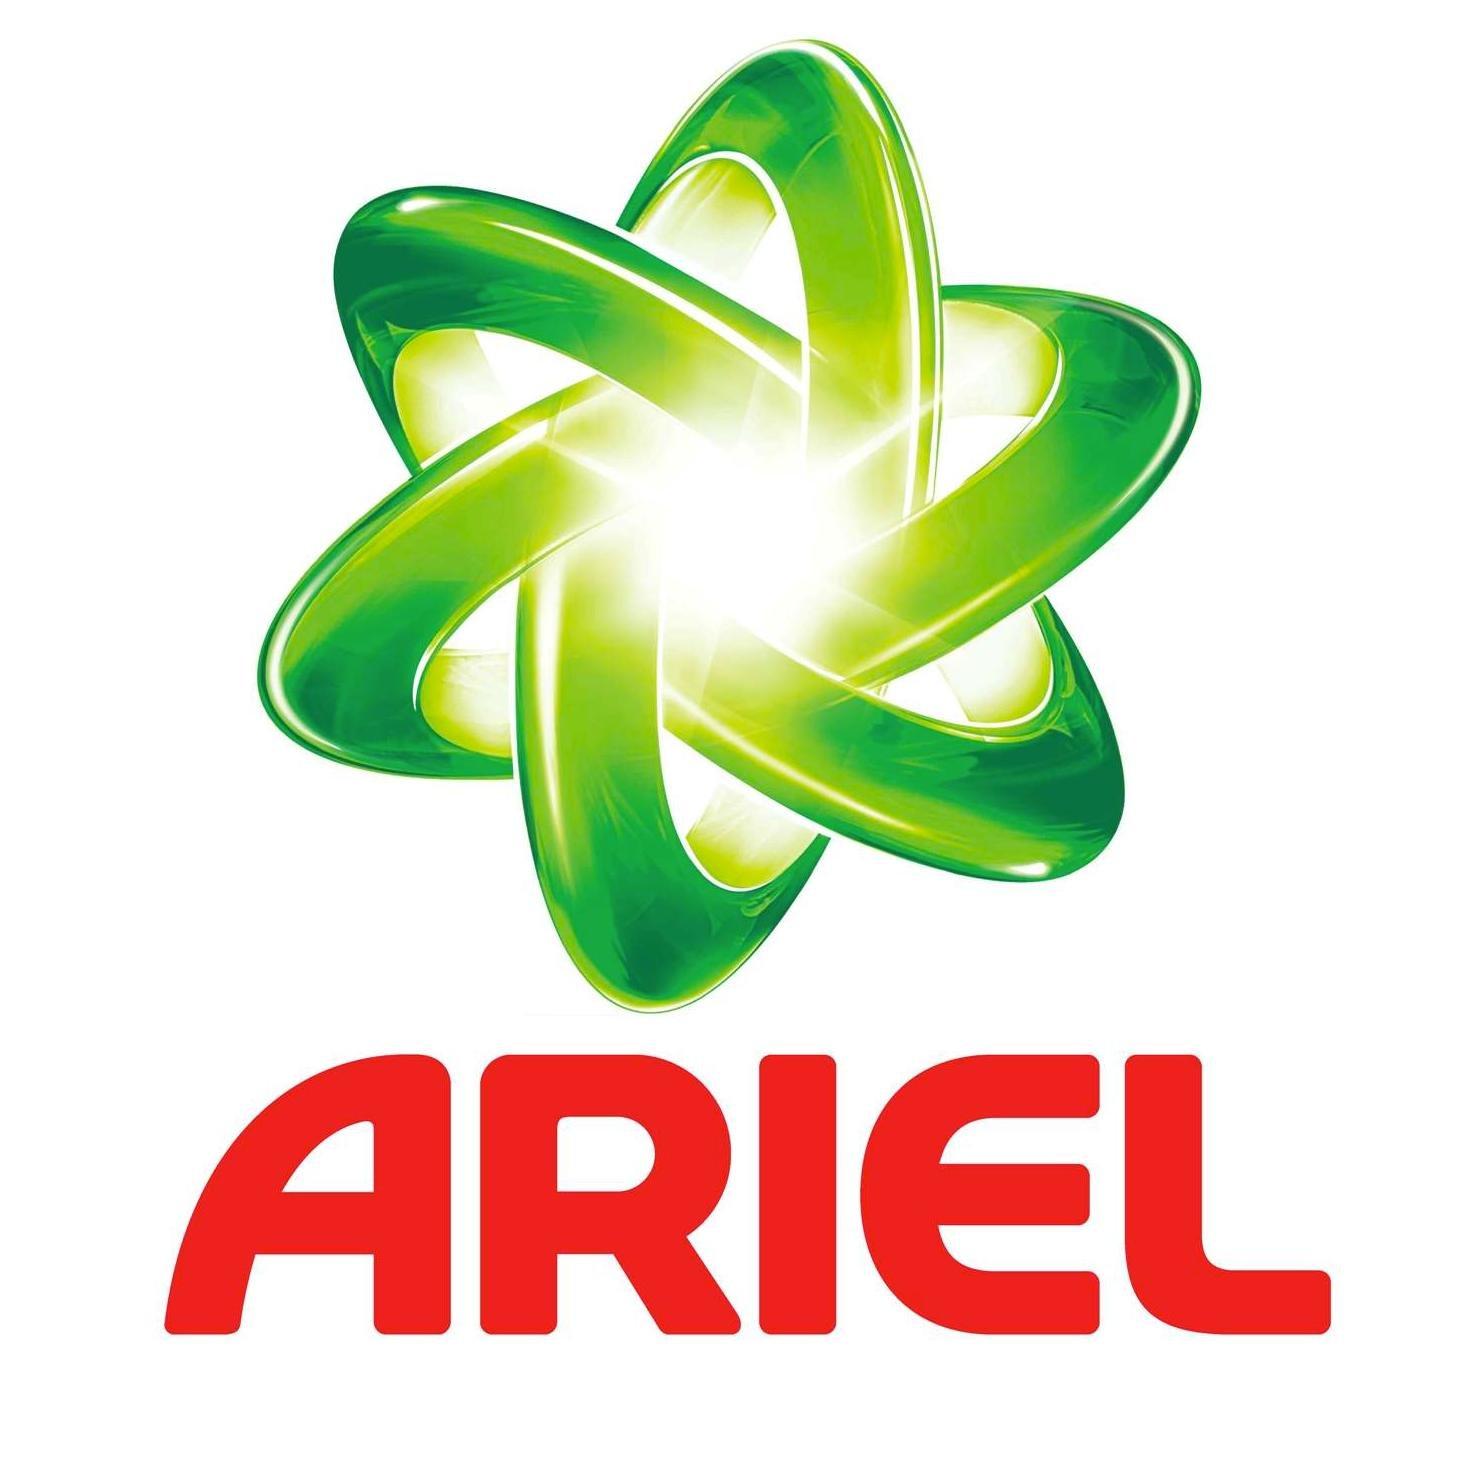 ariel-logo-vector-png-ariel-logo-1477.jpg